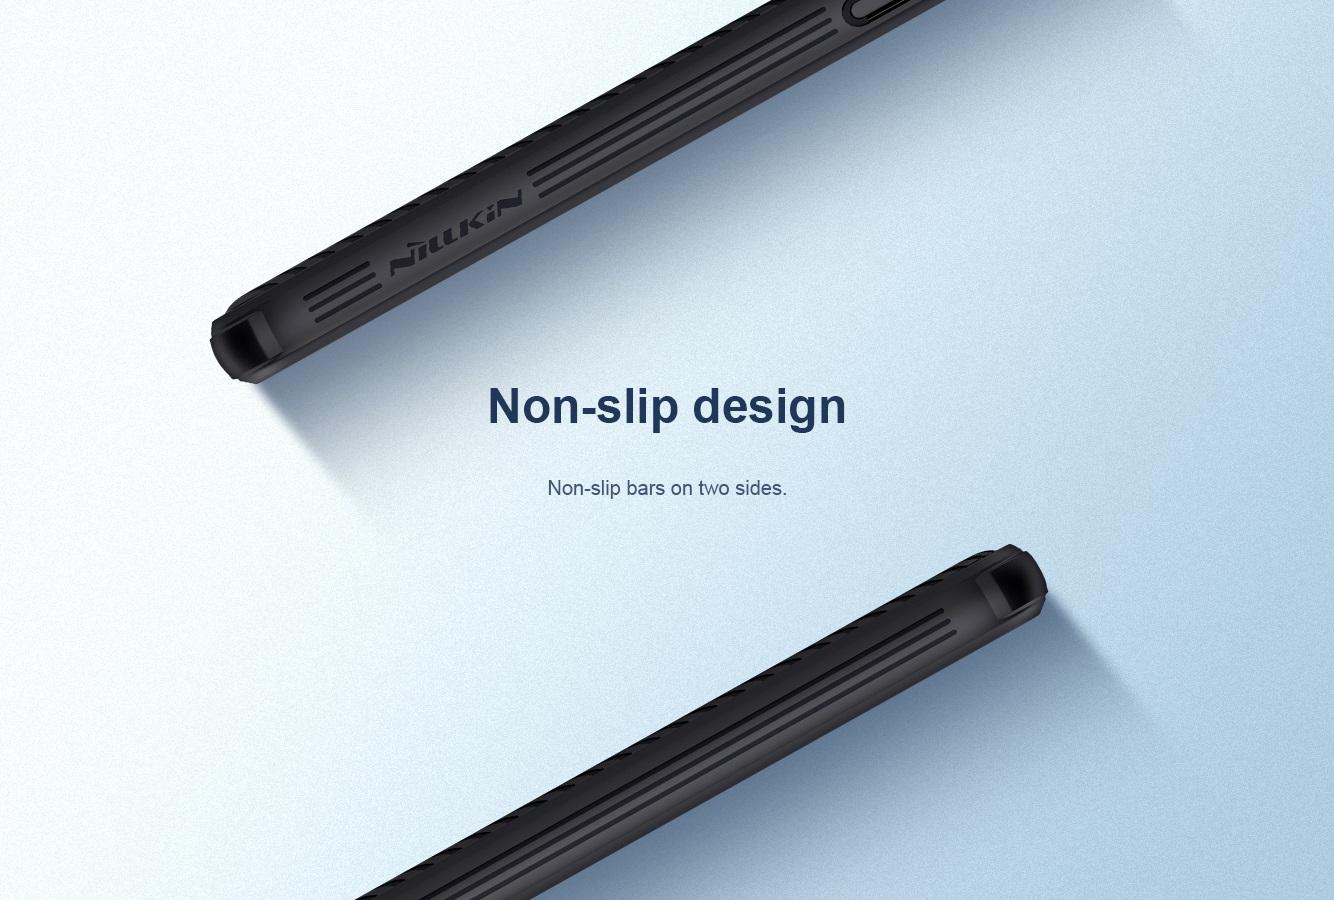 OnePlus_9_CamShield_Pro_Case-06.jpg